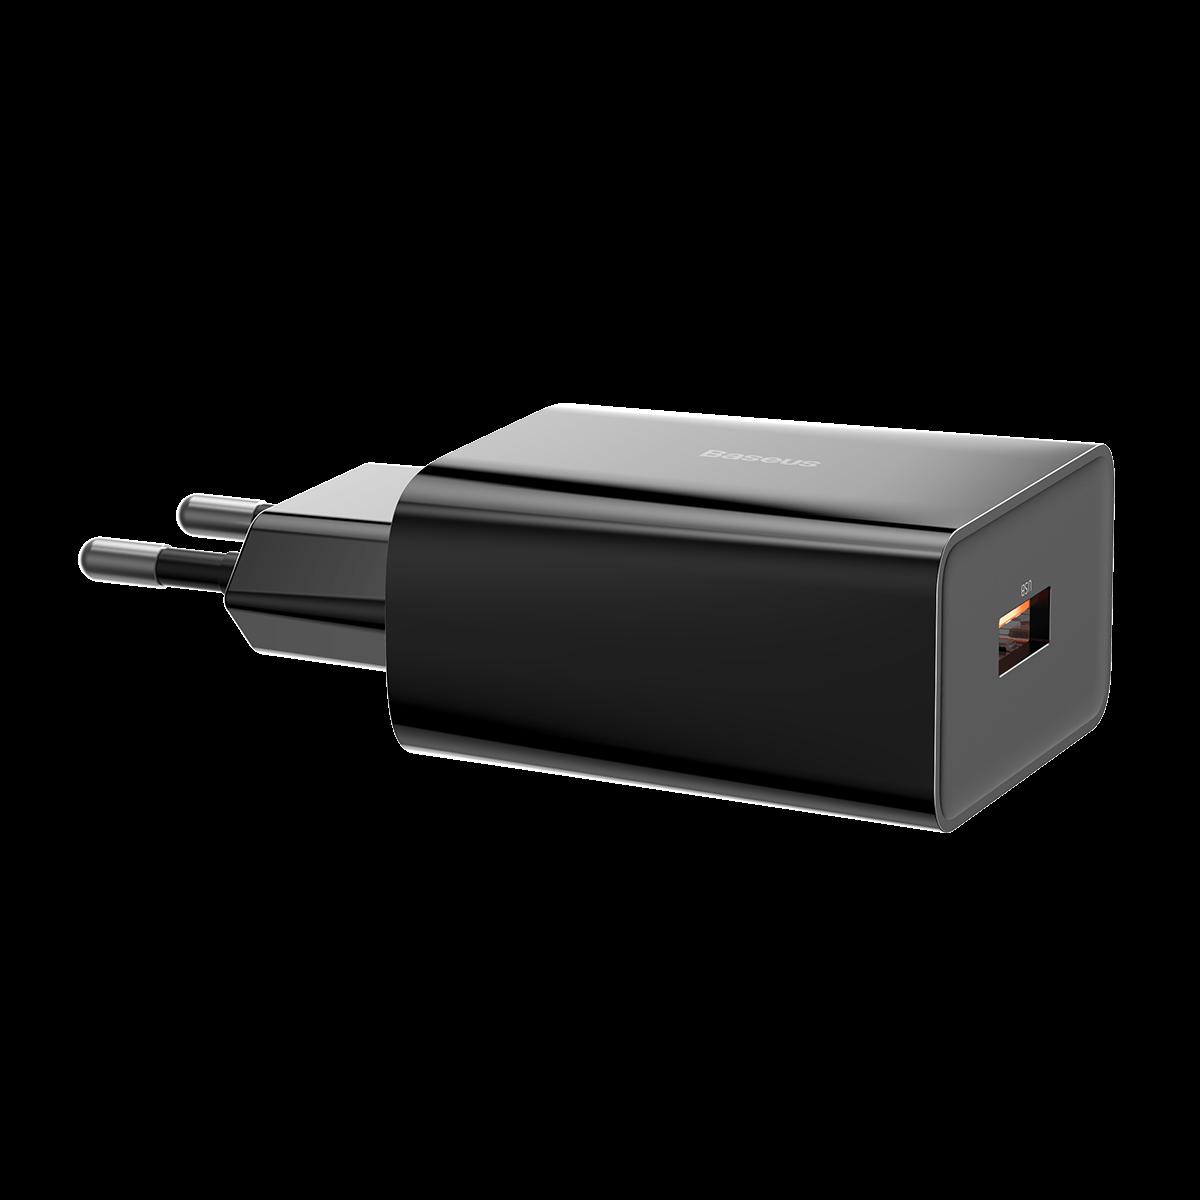 Carregador de Parede Baseus Speed Mini QC 18w